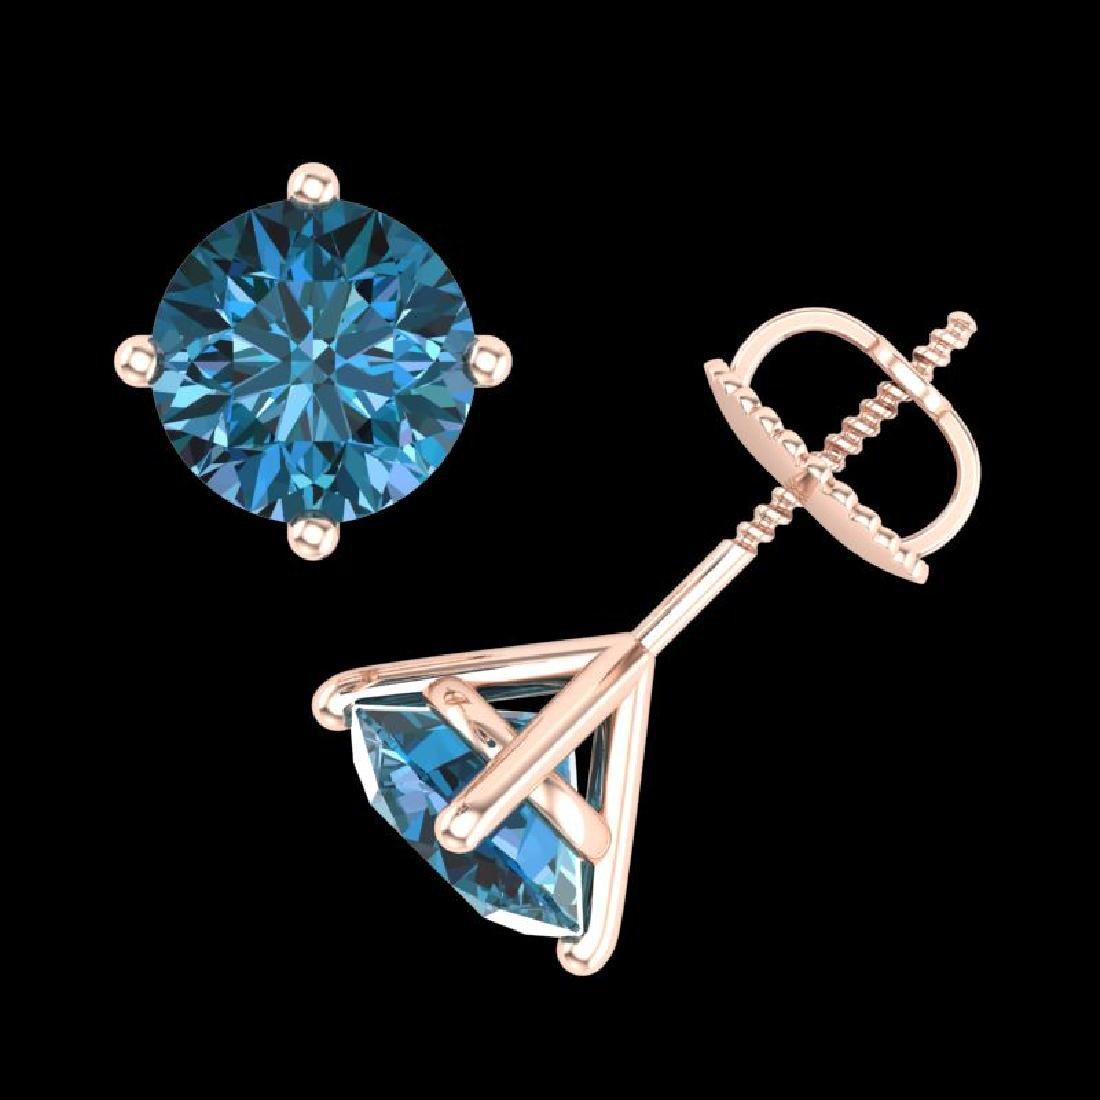 2.5 CTW Fancy Intense Blue Diamond Art Deco Stud - 3